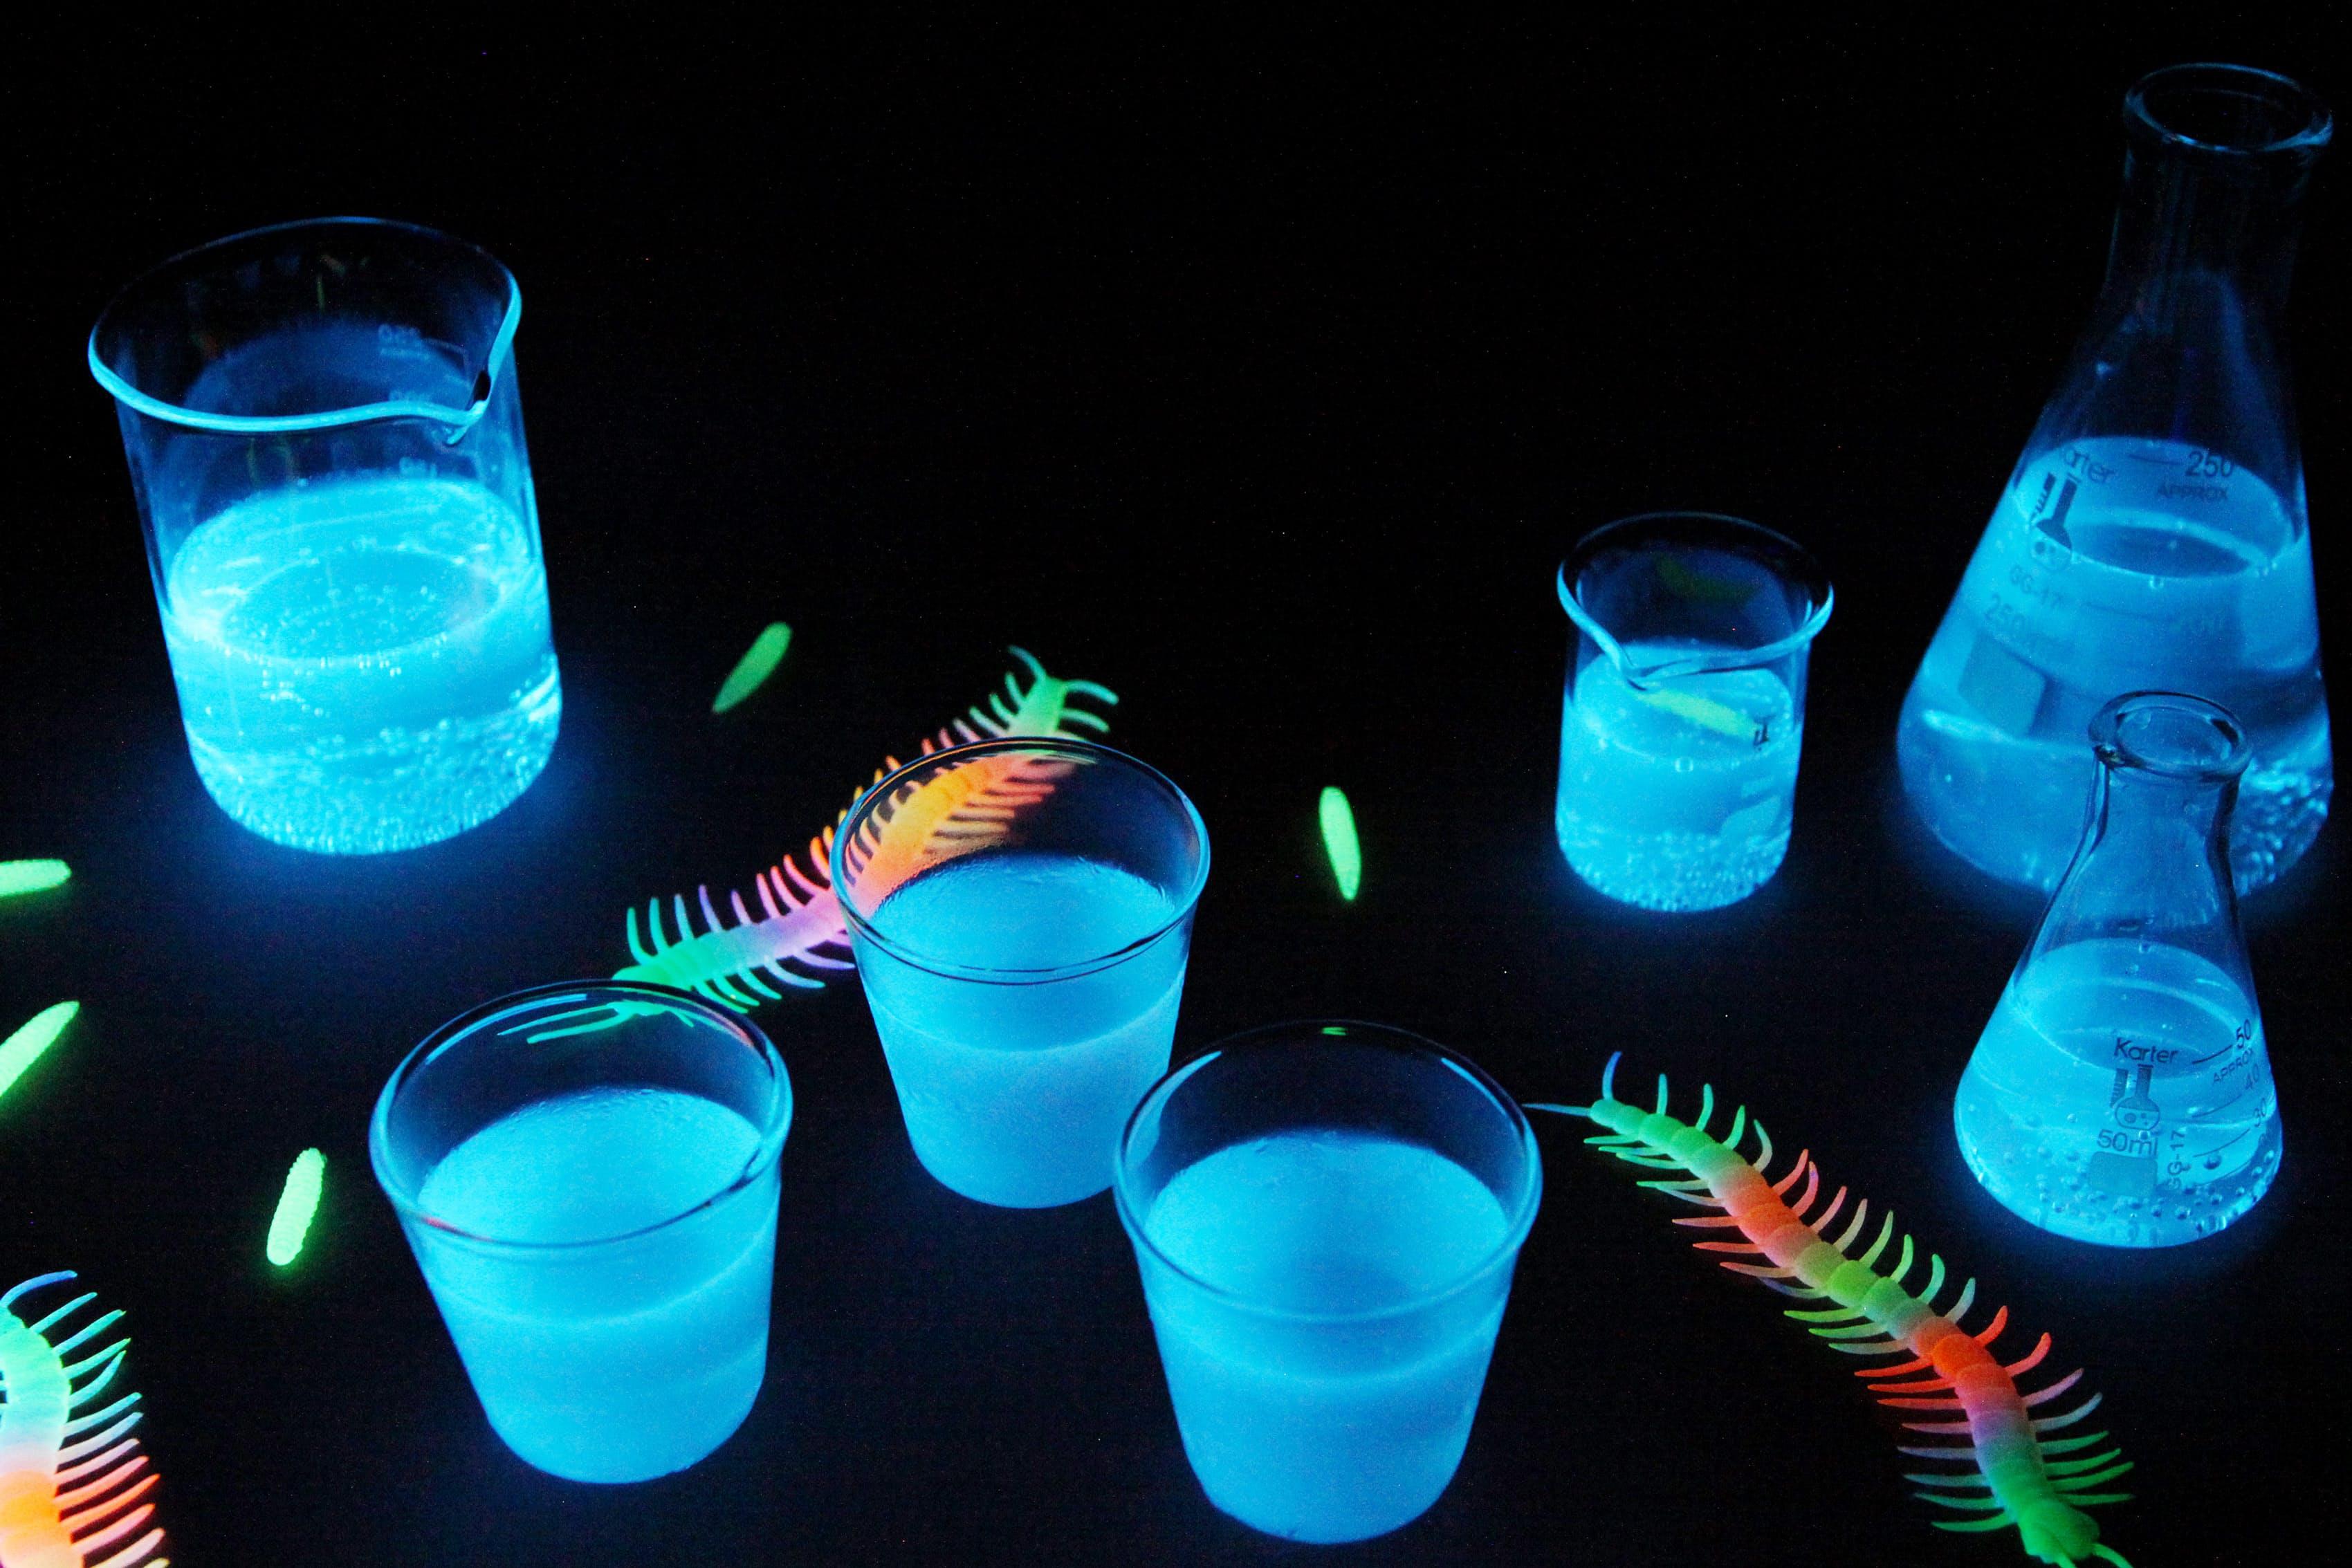 Glow-in-the-Dark Jello Shots